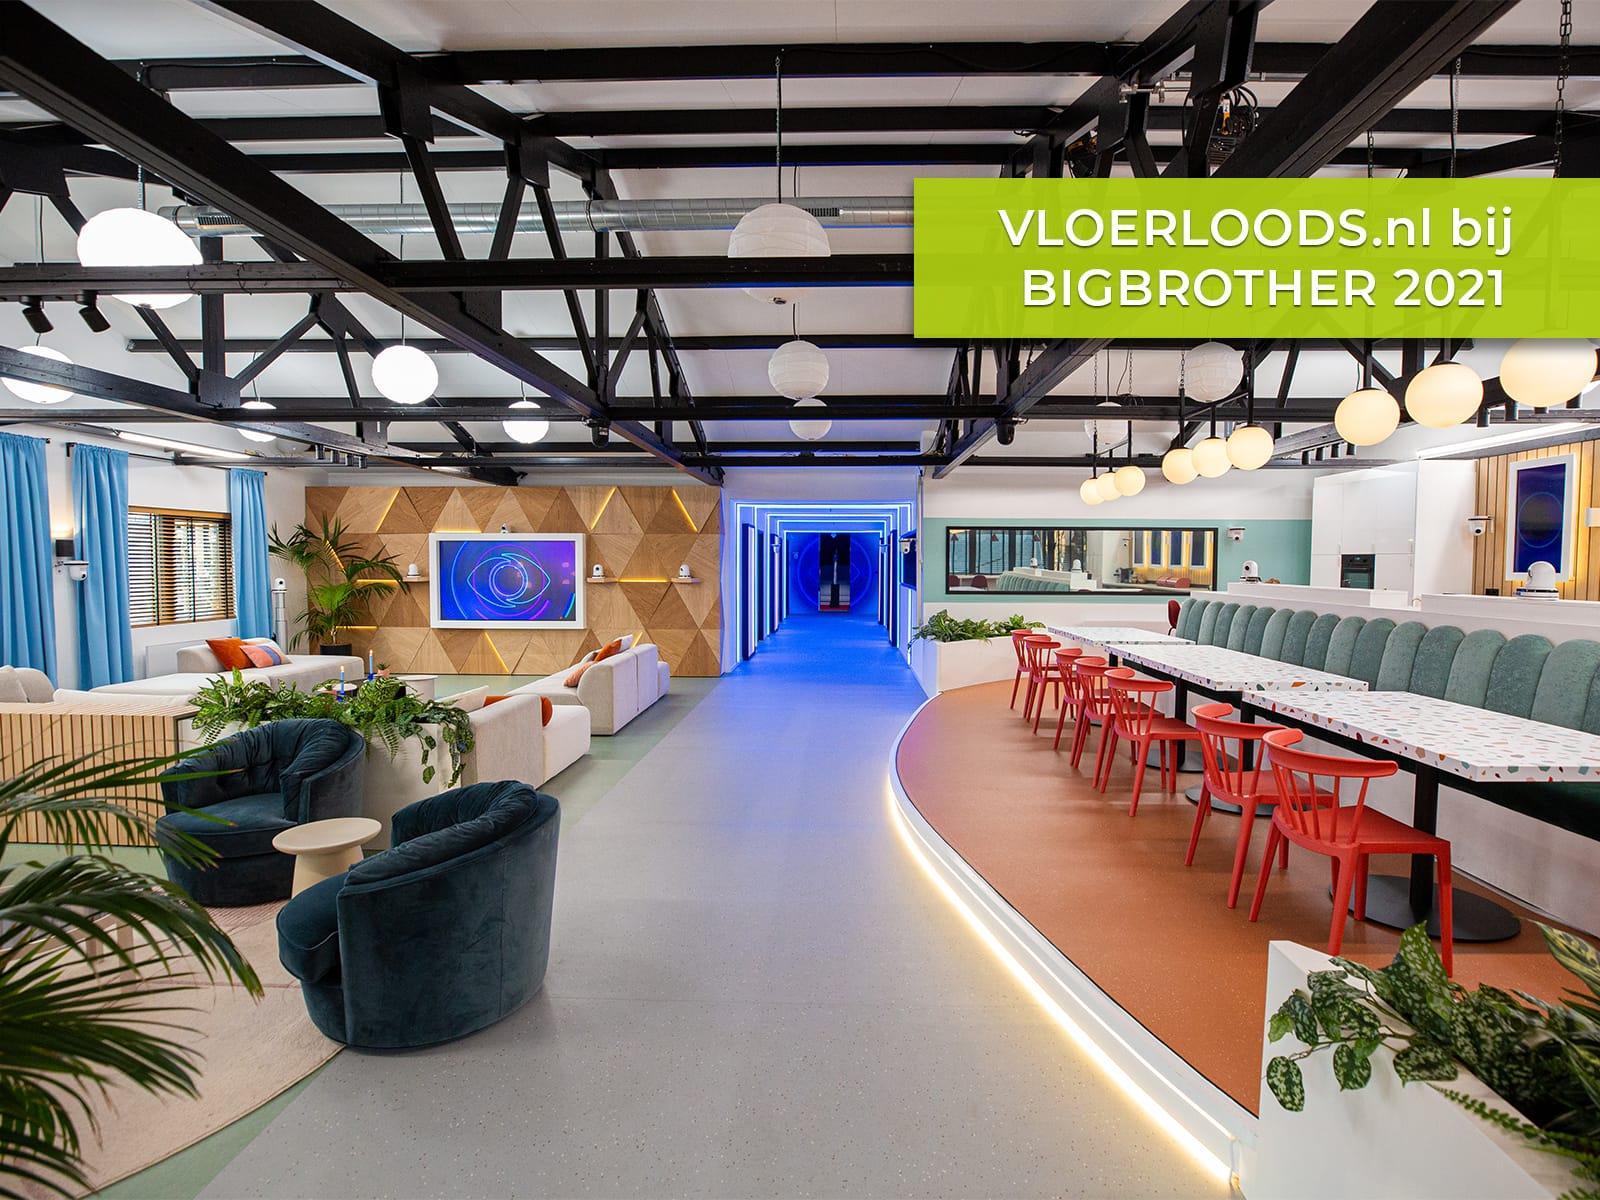 Vloerloods.nl bij BigBrother 2021